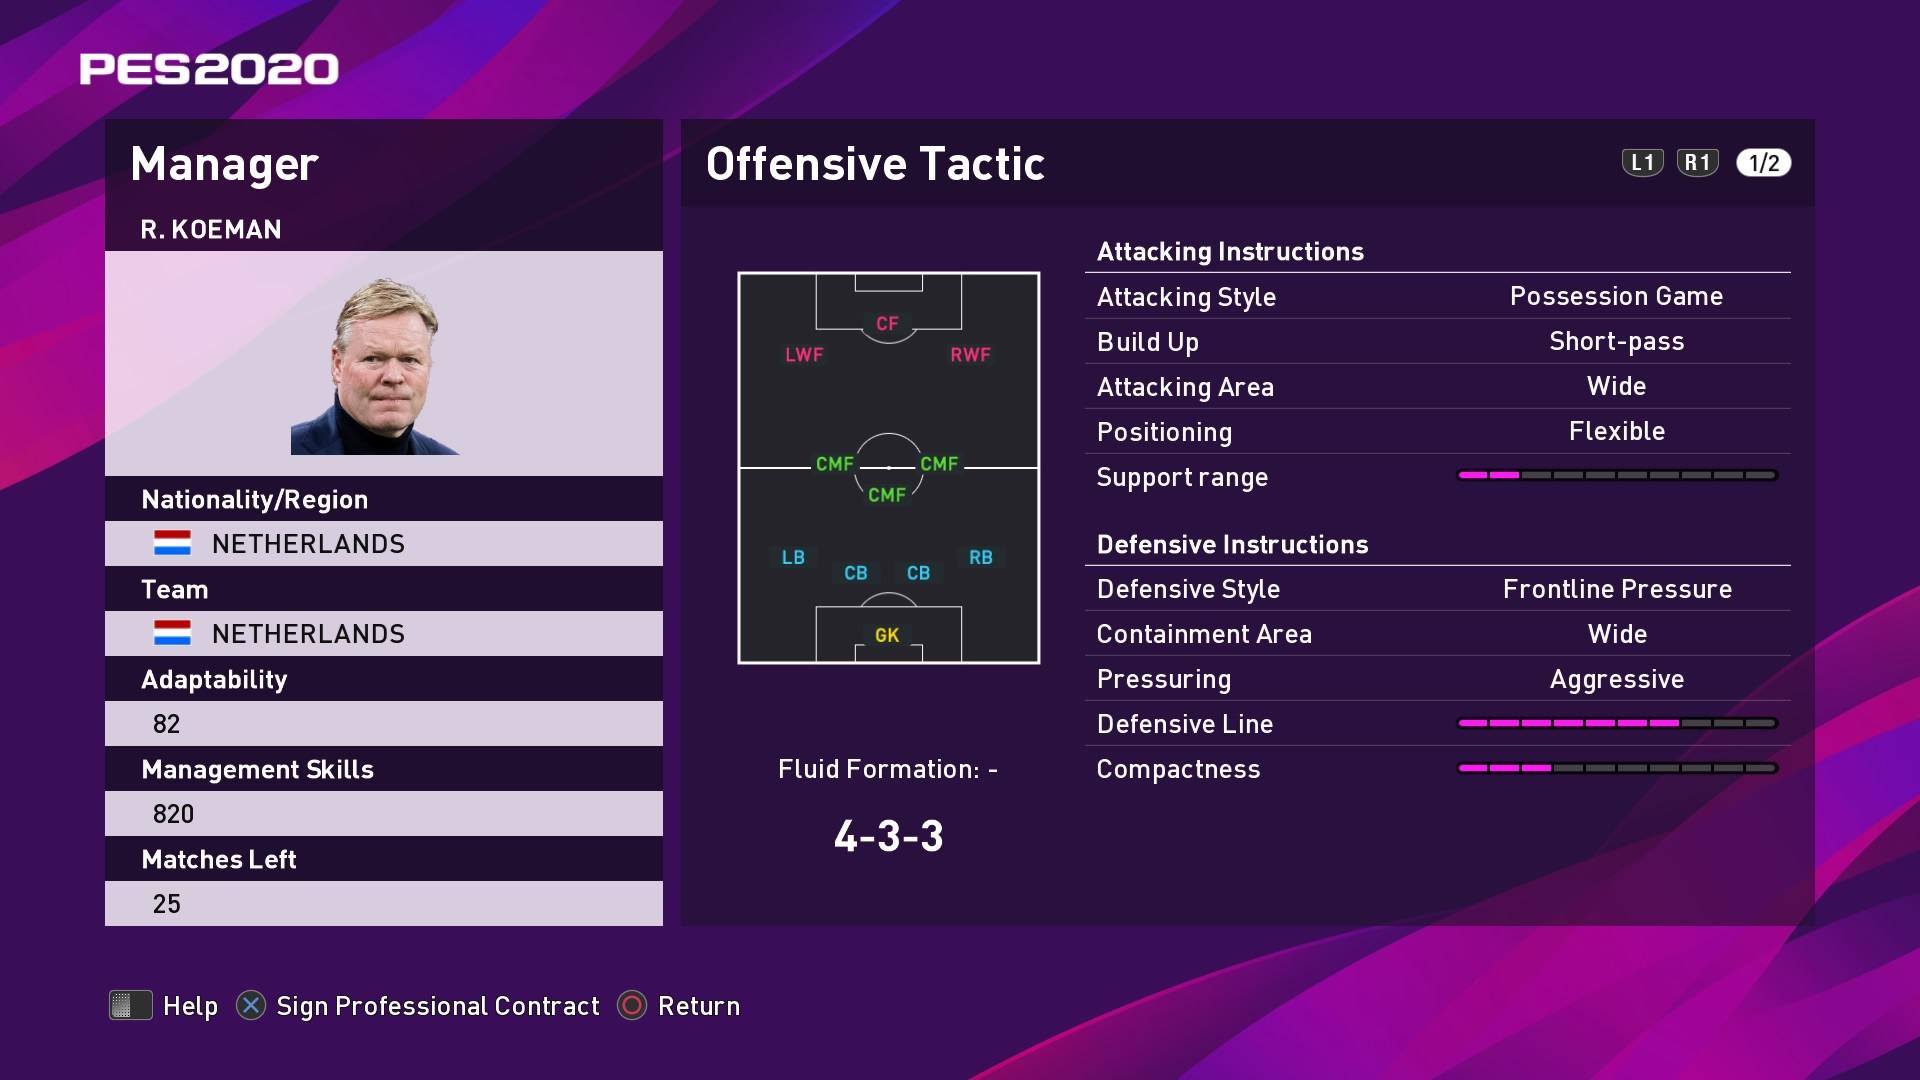 R. Koeman (2) (Ronald Koeman) Offensive Tactic in PES 2020 myClub